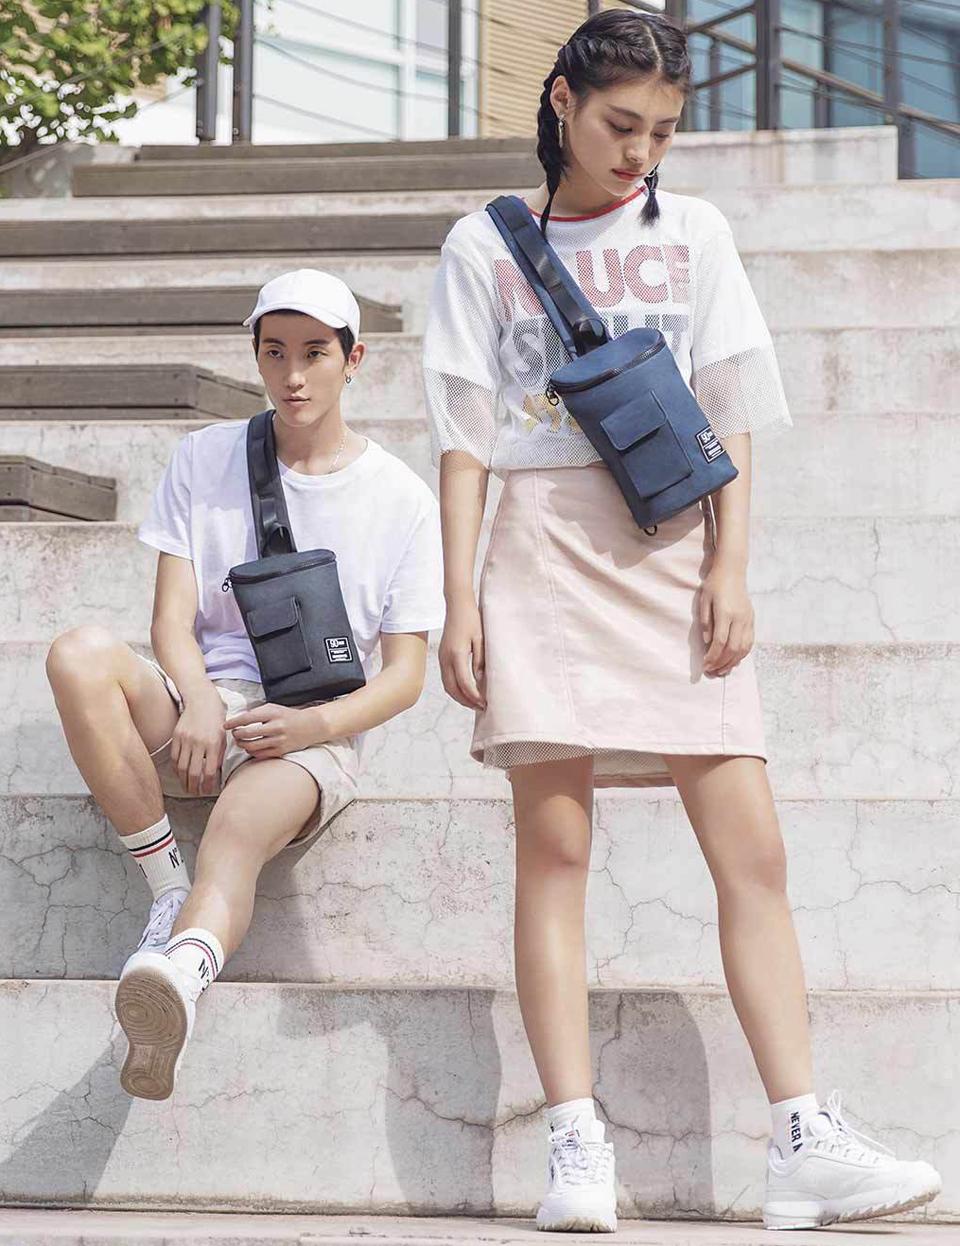 Сумка RunMi 90 Chic Casual Chest Bag парень и девушка